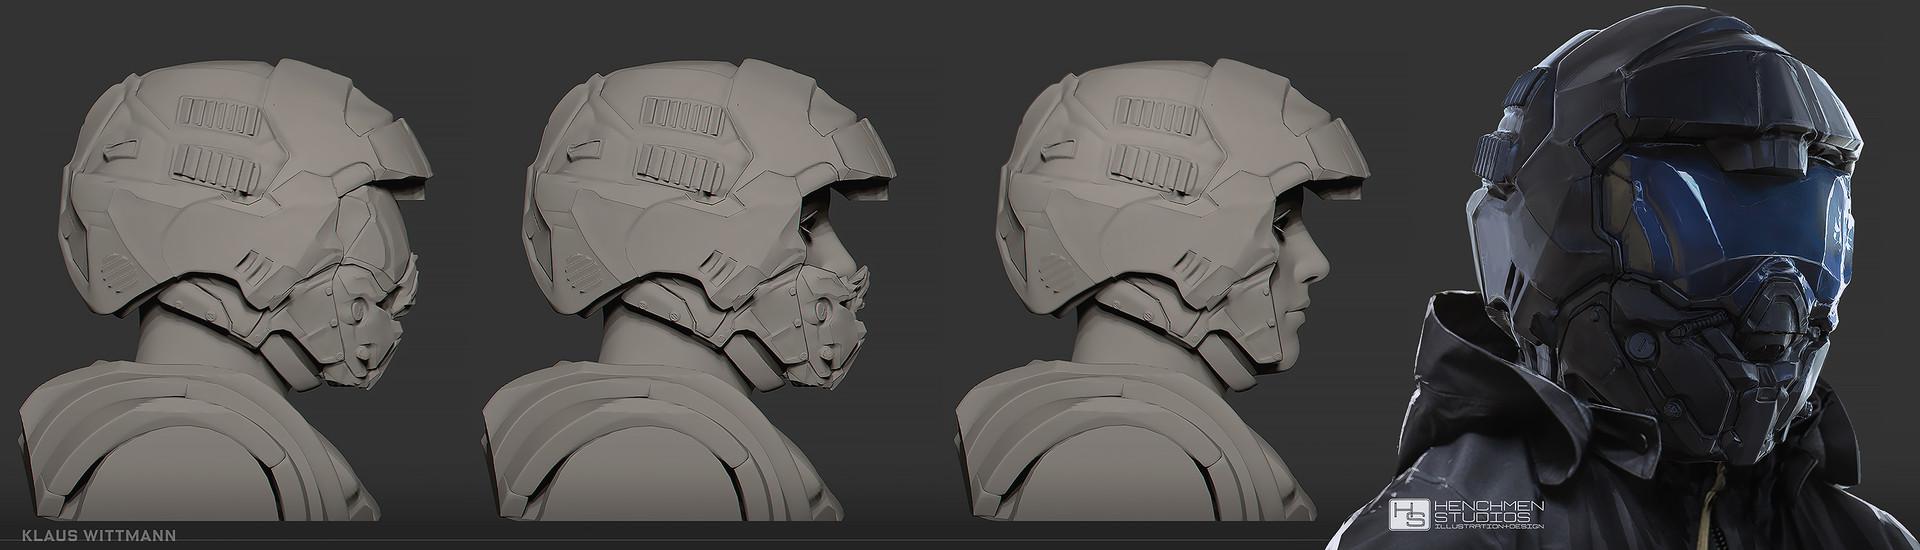 Klaus wittmann helmet